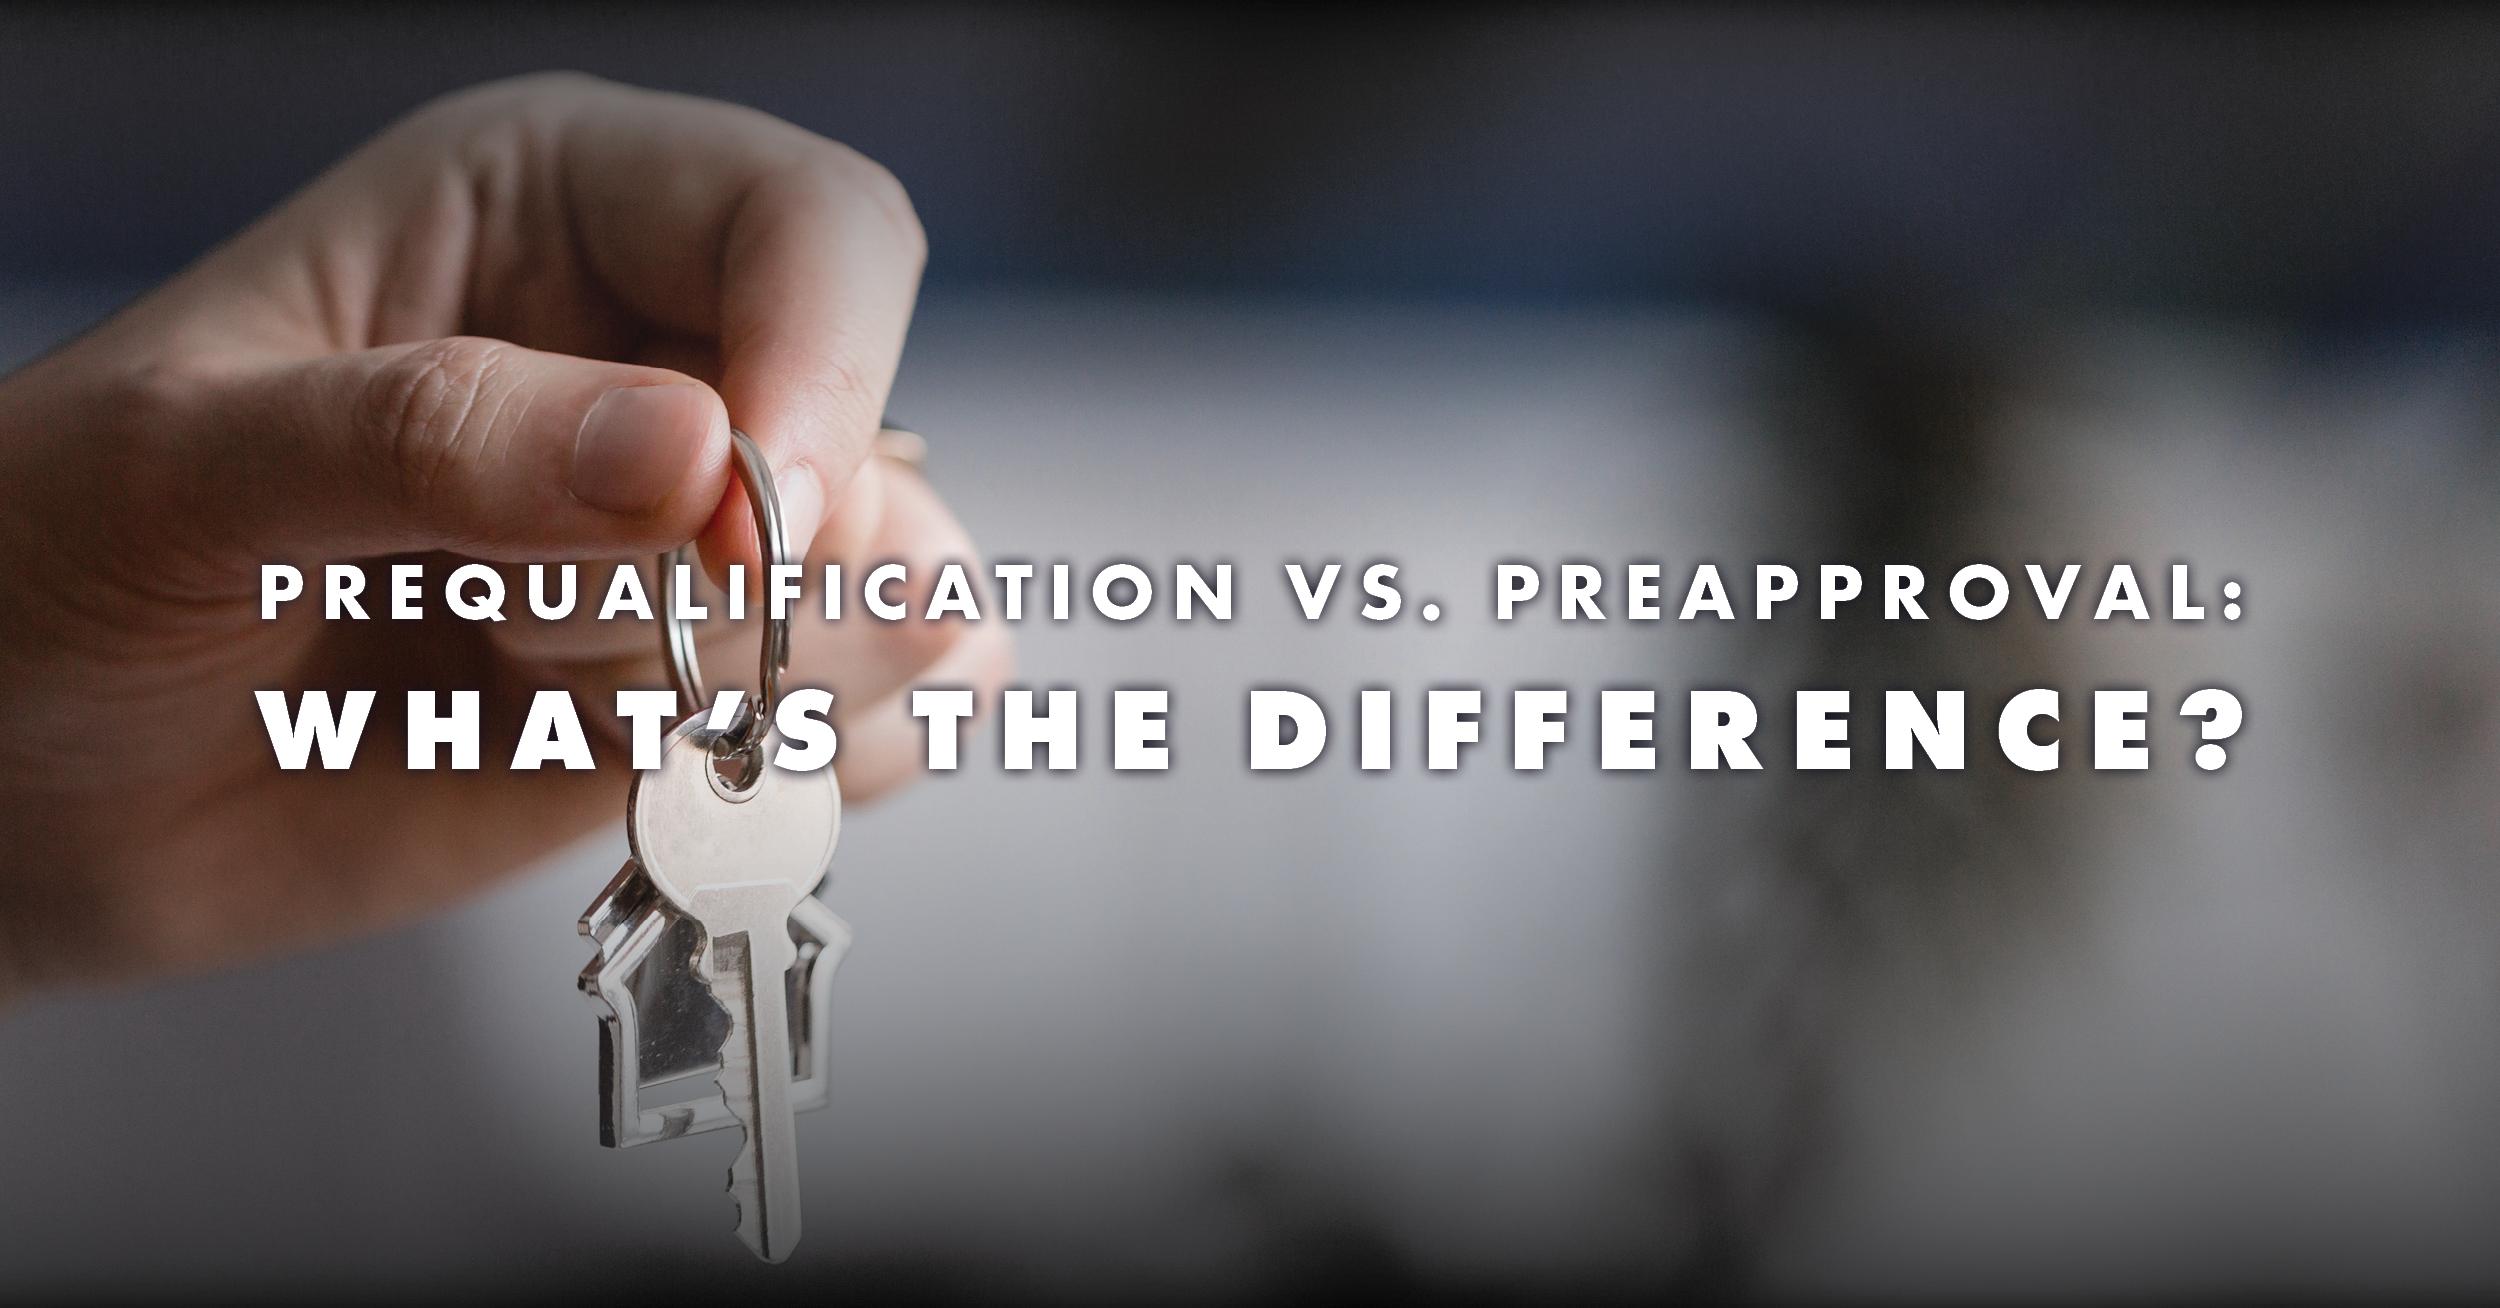 Prequalification vs. Preapproval